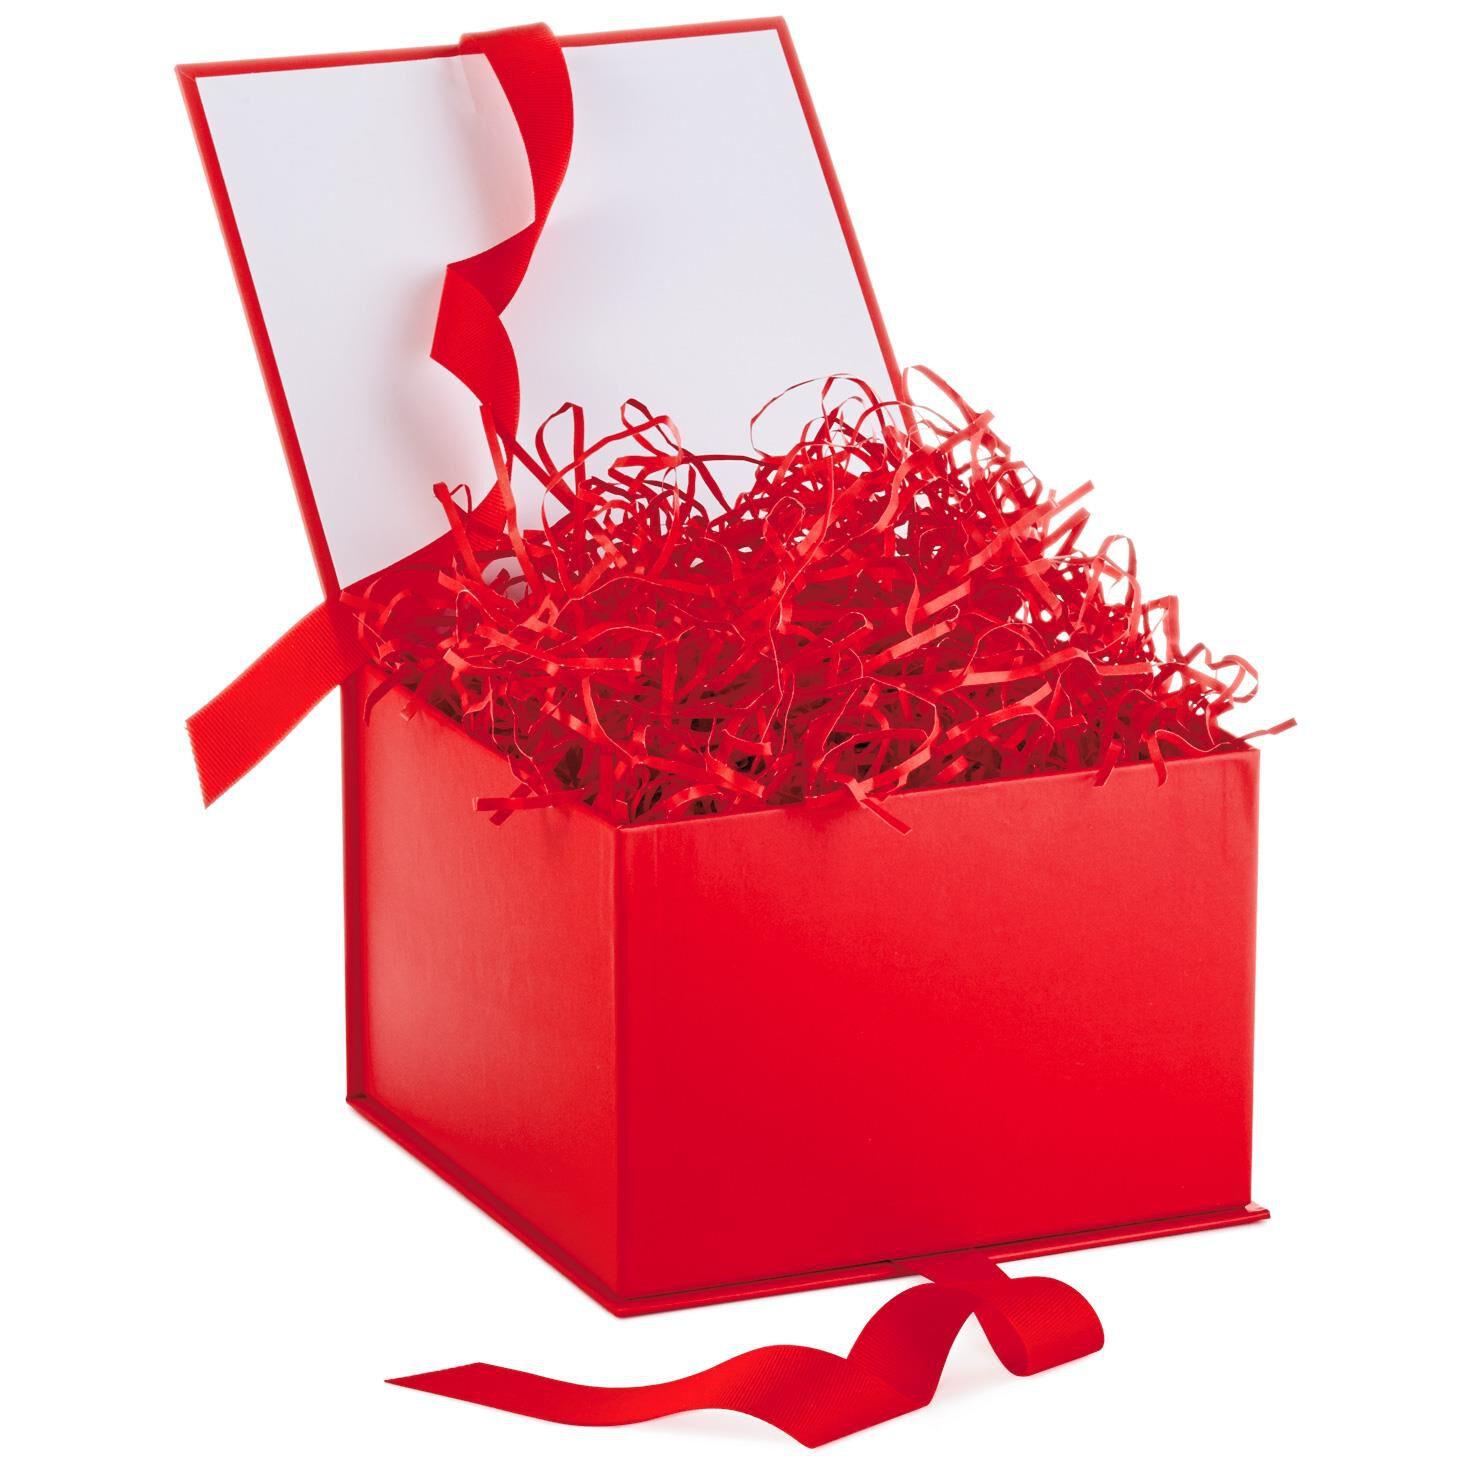 ... Red Large Gift Box With Shredded Paper Filler  sc 1 st  Hallmark & Gift Boxes | Hallmark